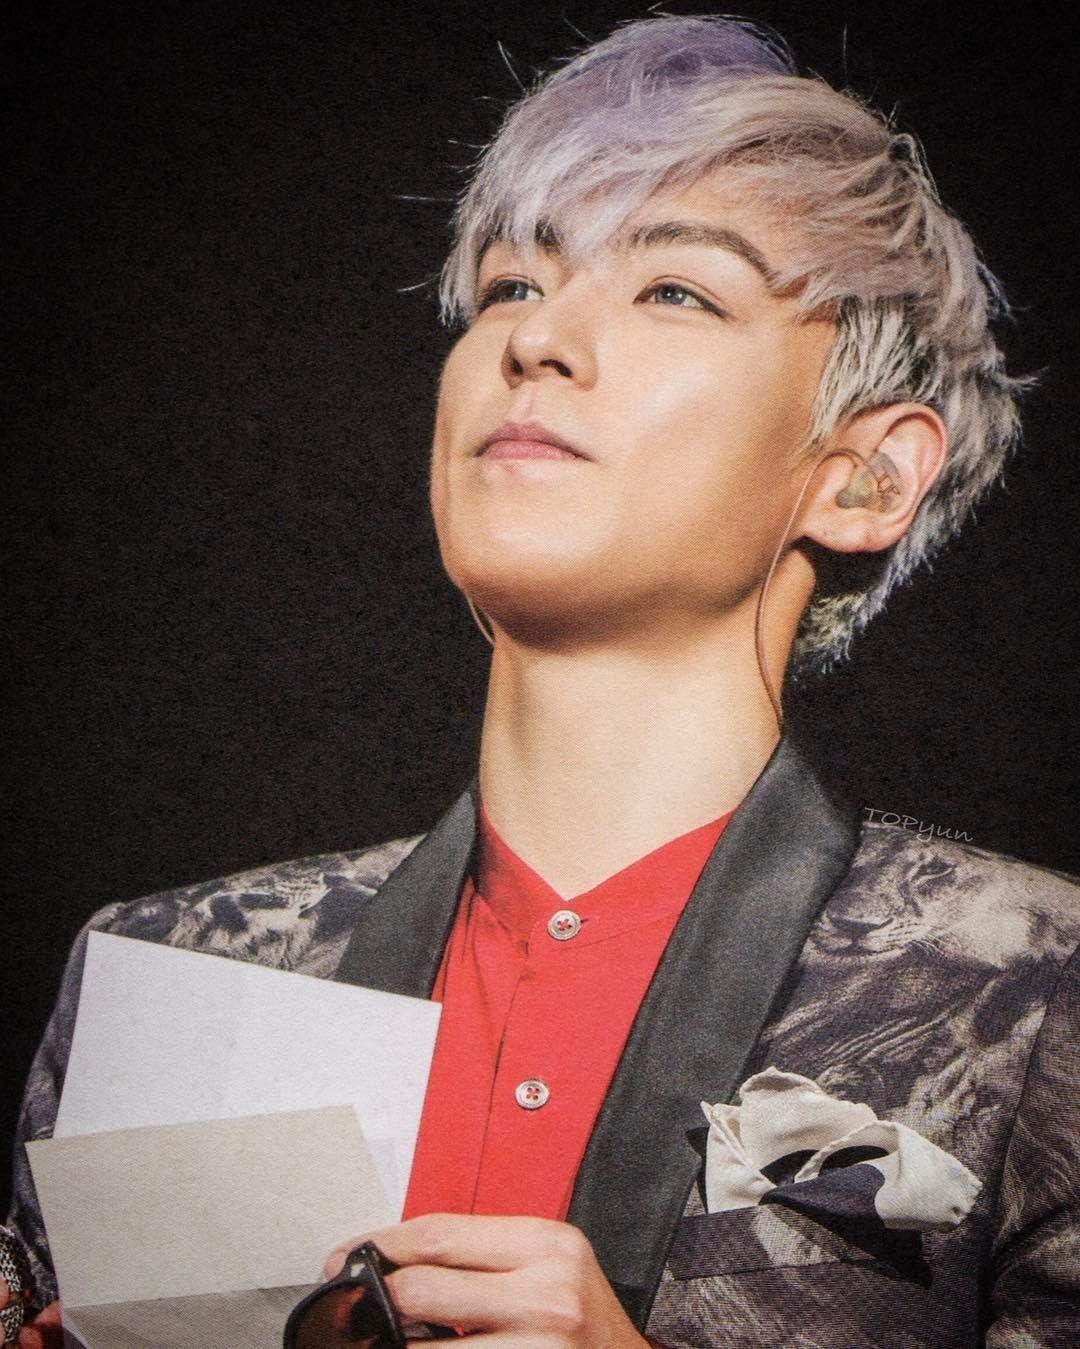 BIGBANG TOP